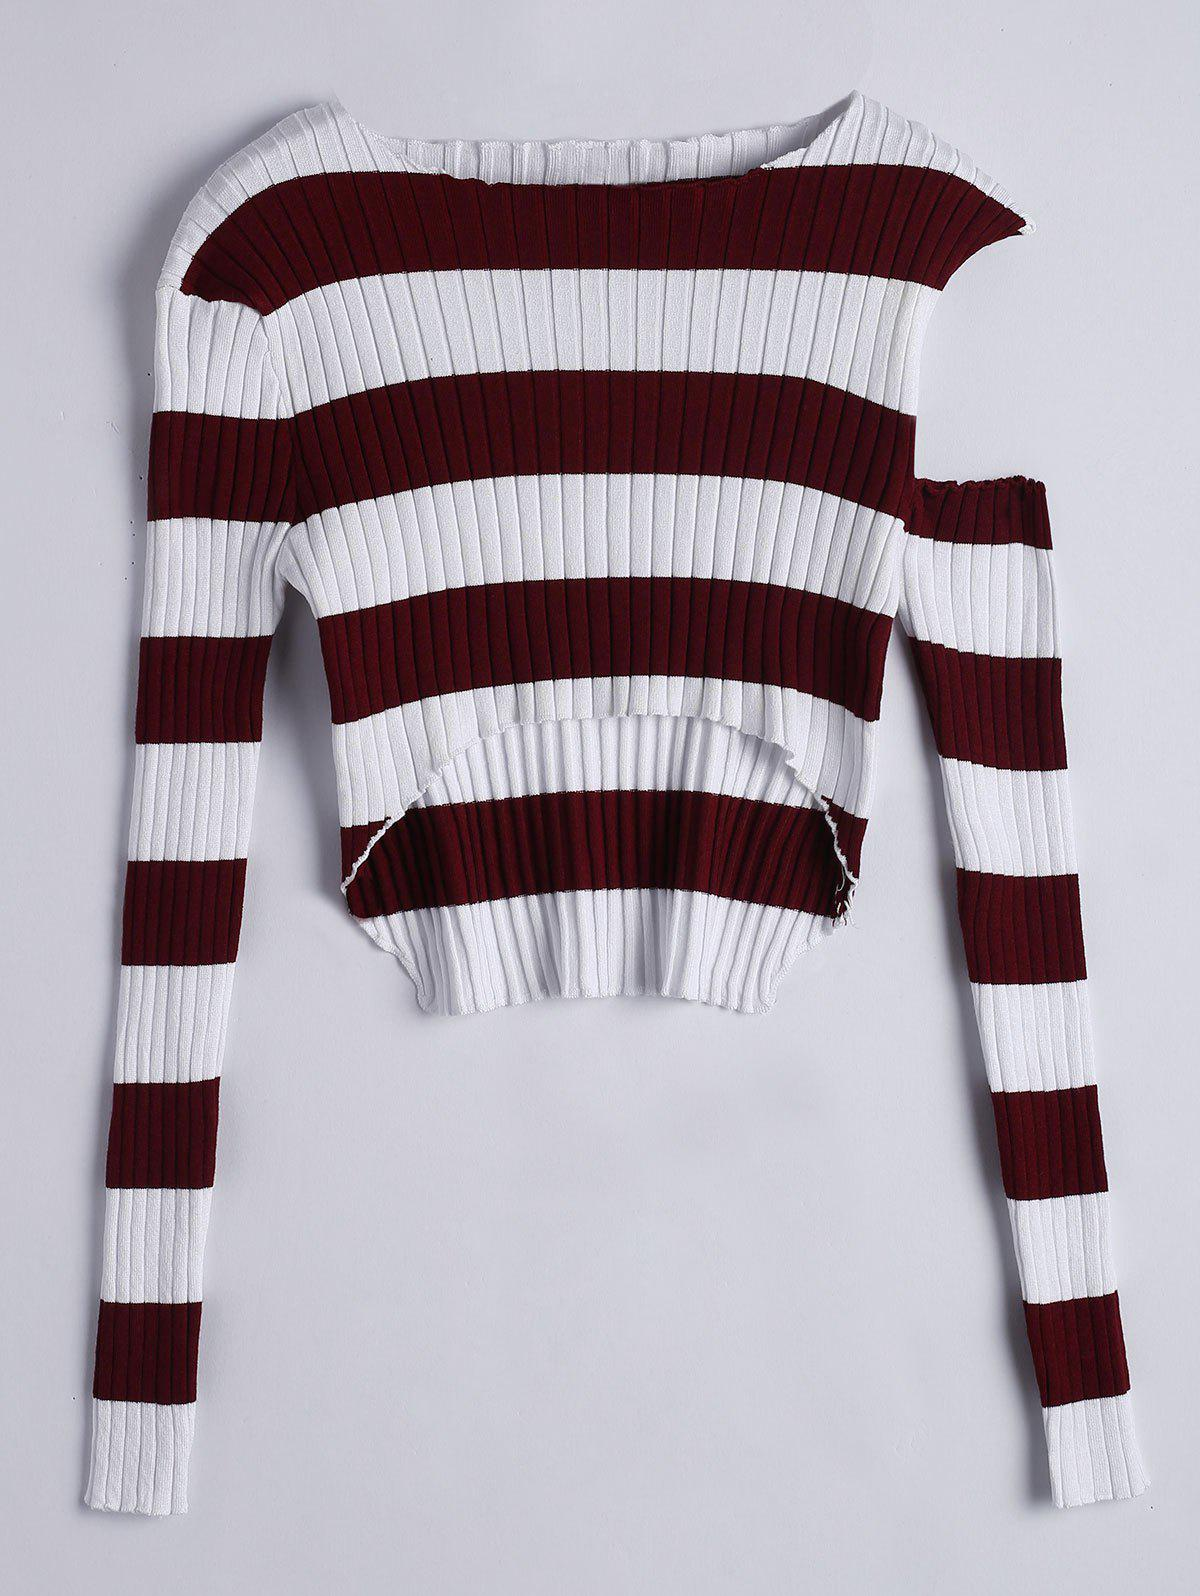 Asymmetrical Cut Out Striped Knitwear 221717303